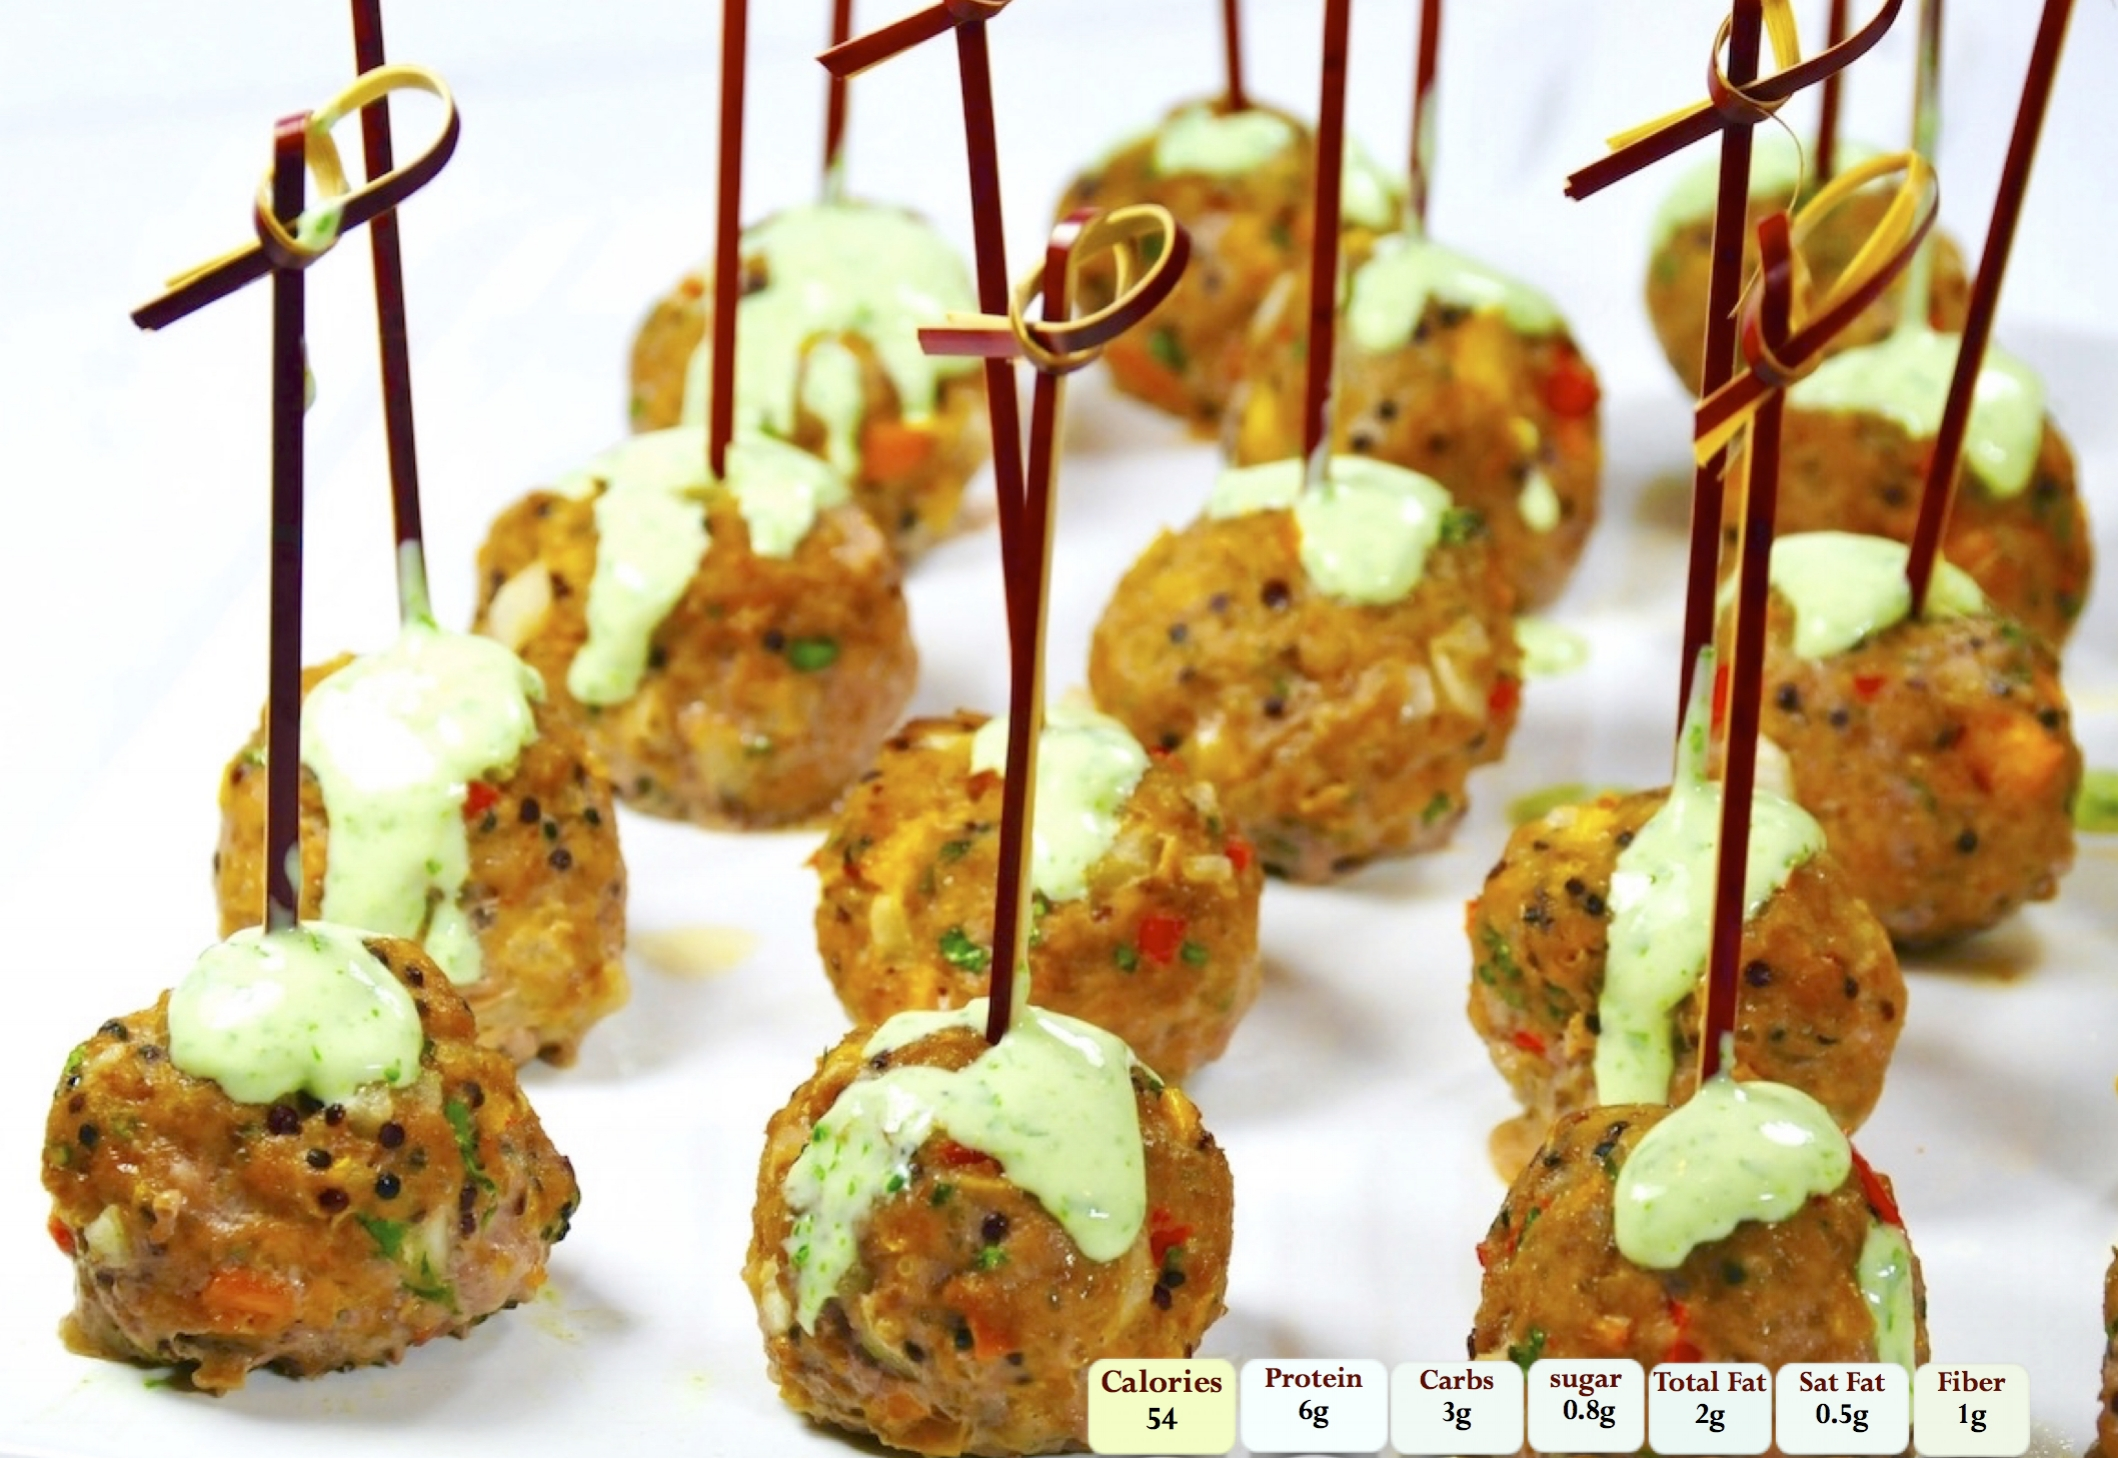 Turkey Quinoa Lollipos With Yogurt Cilantro Dip.jpg